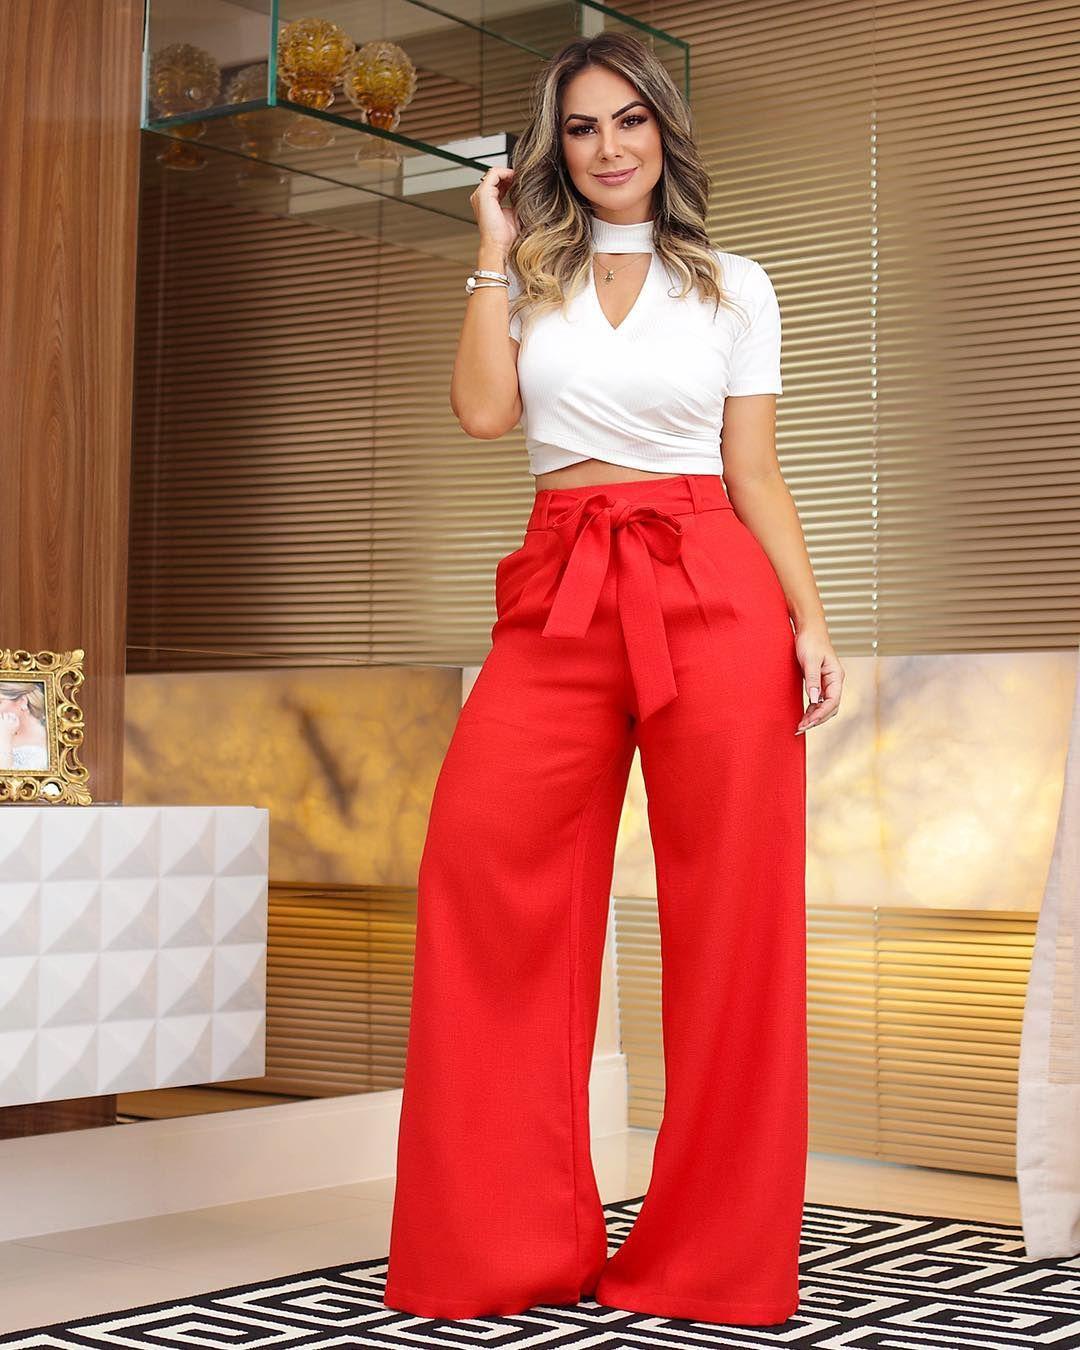 17494ba6ab7e Calça Pantalona + Cropped Canelado. #vemver #summer19 #amobaruc ...